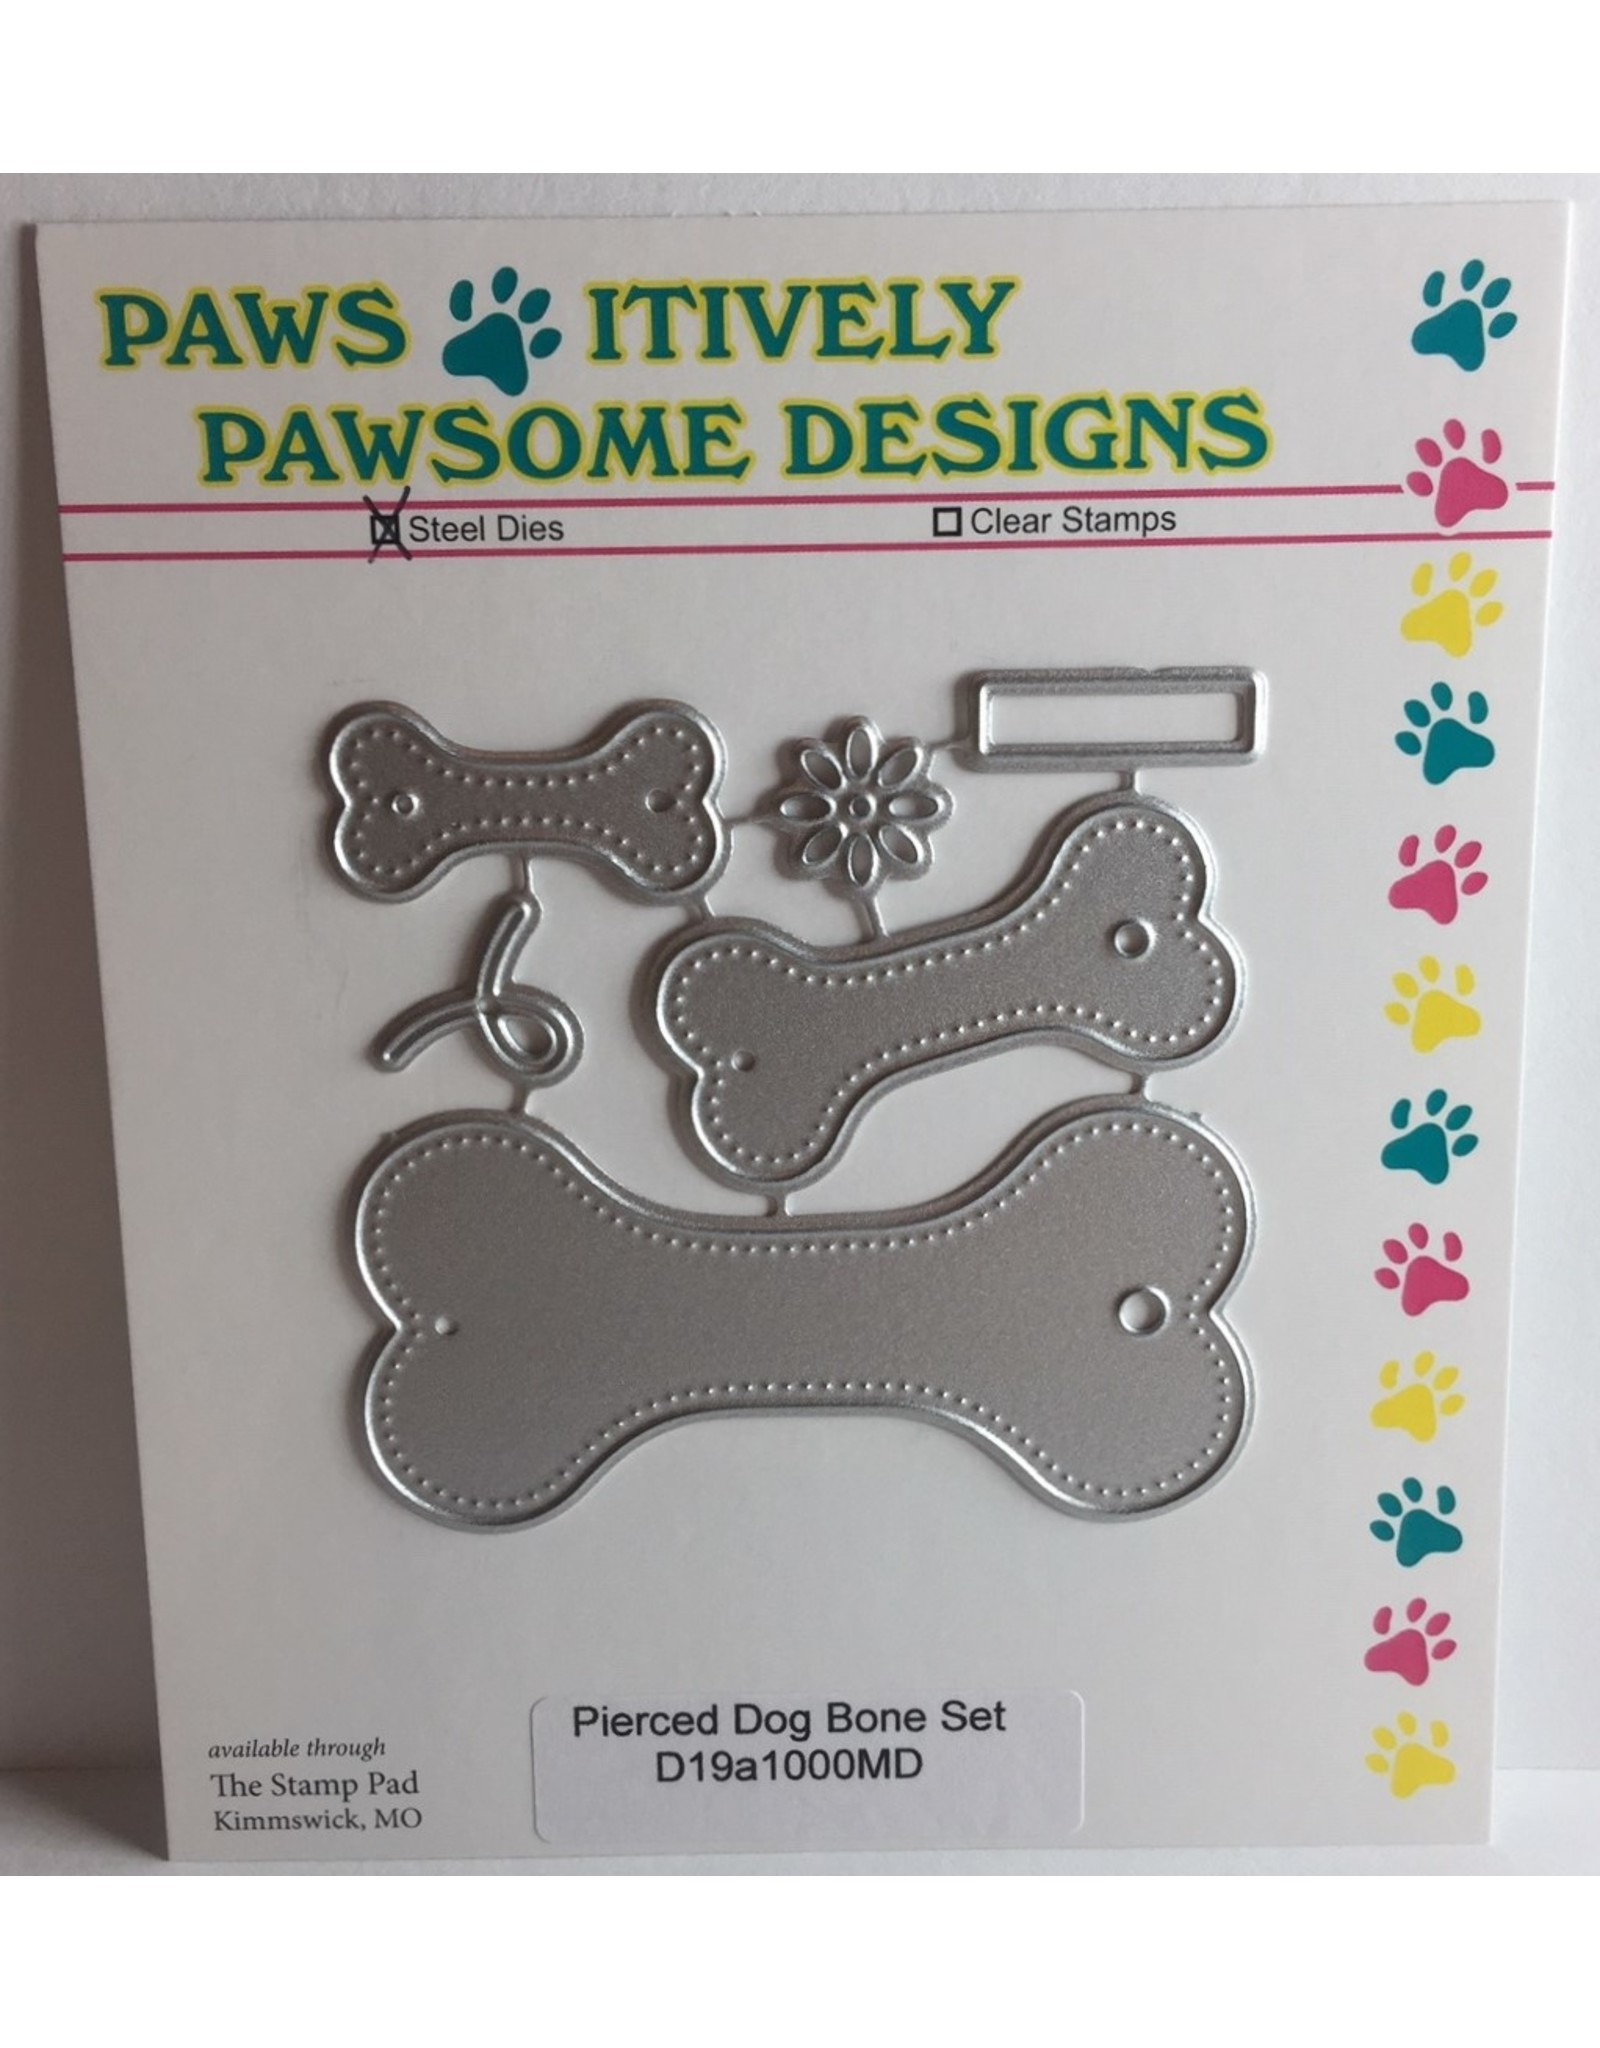 Paws-Itively Pawsome Designs Pierced Dog Bone Tag Set - Die